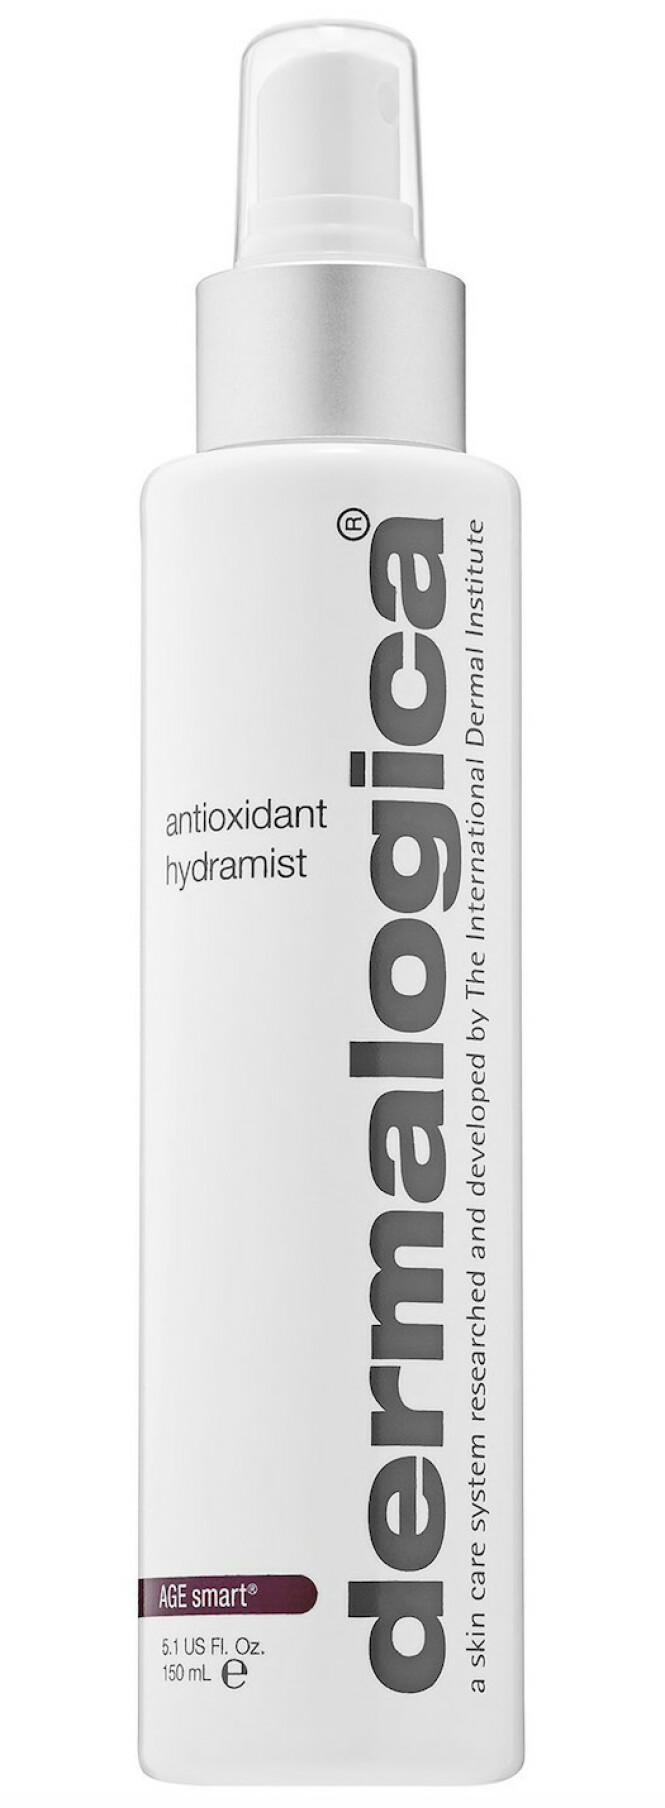 Mist med antioksidanter (kr 415, Dermalogica, antioxidant Hydramist). FOTO: Produsenten